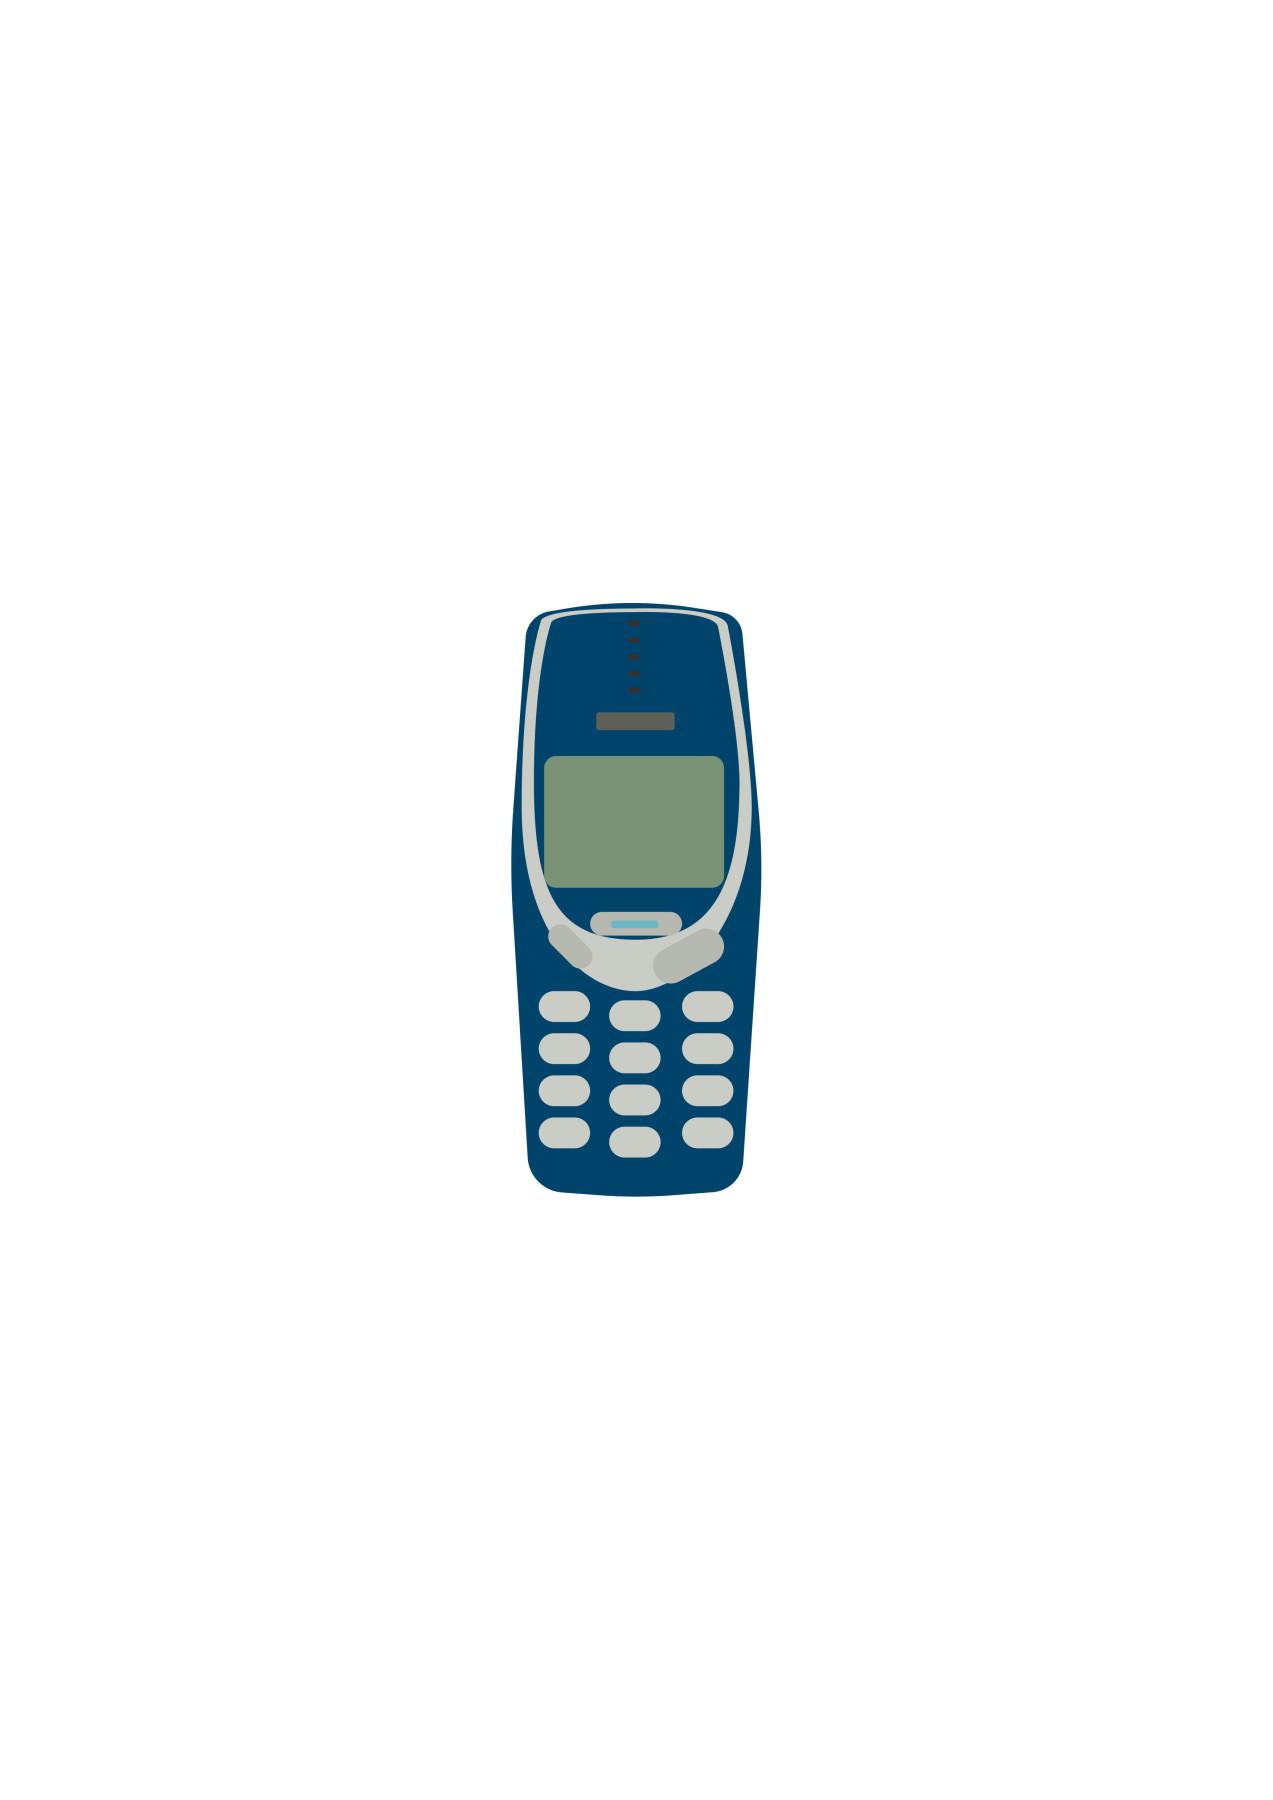 "alt=""Nokia 3310 emoji"""